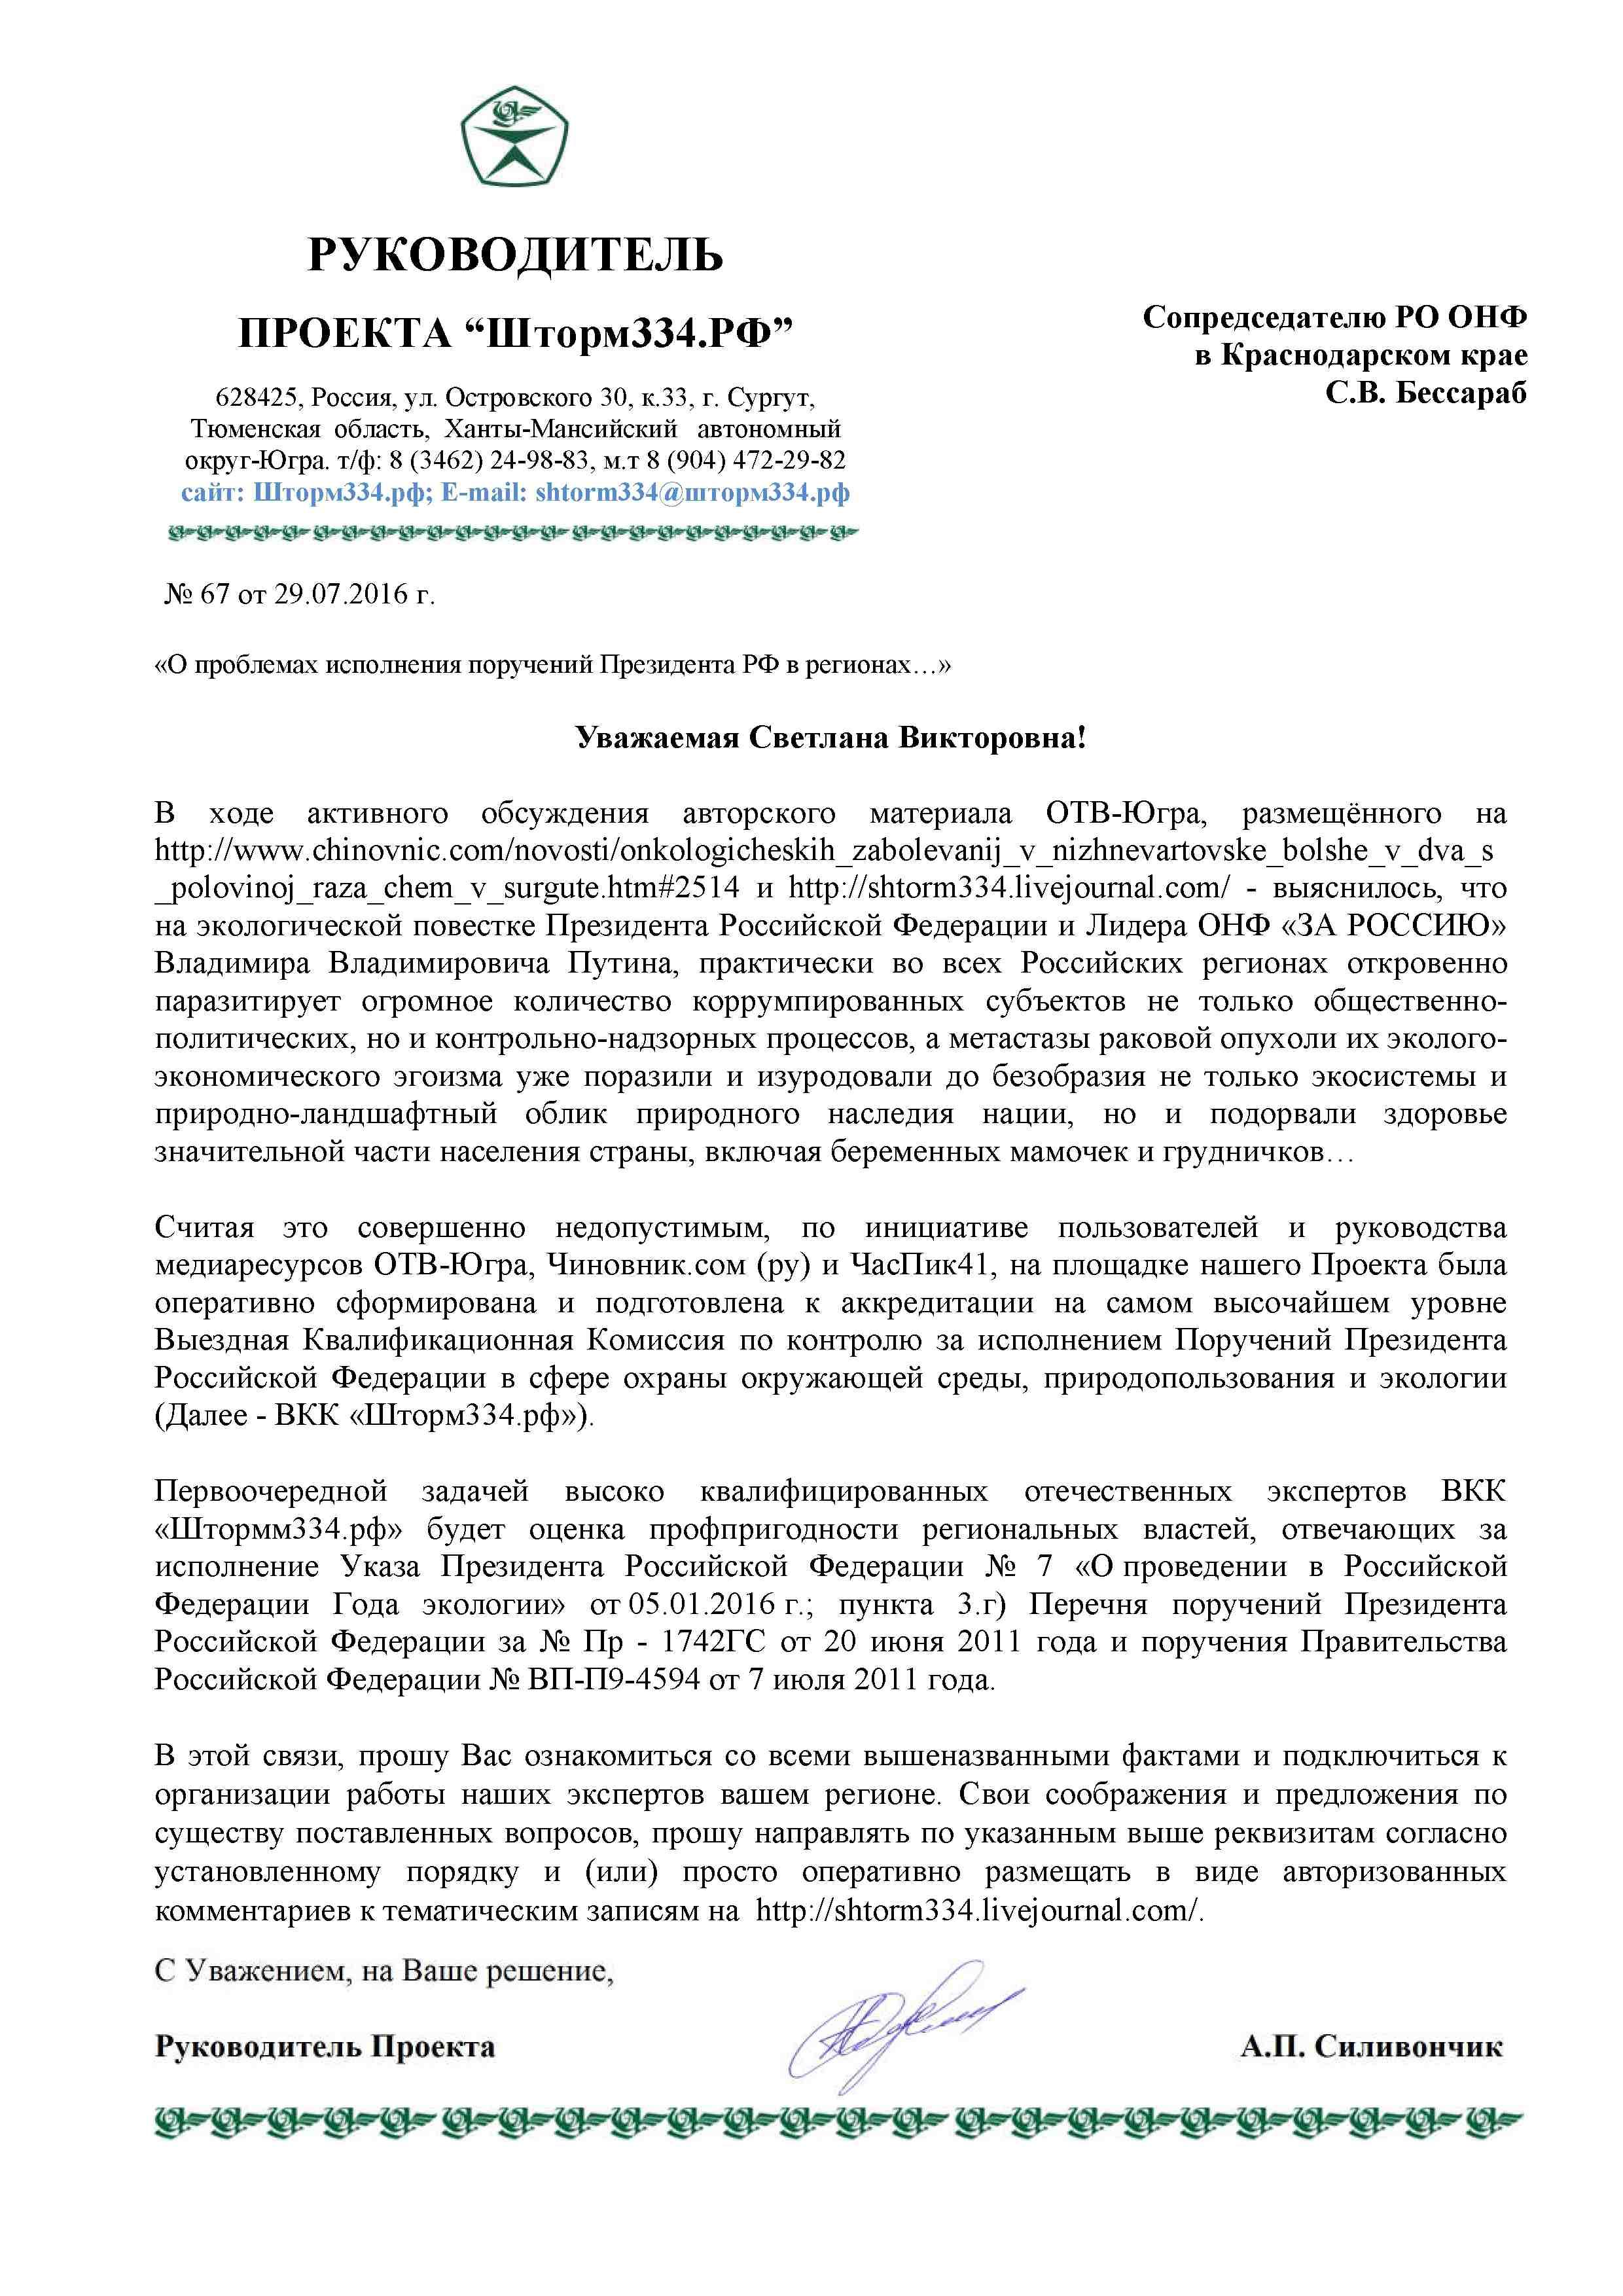 РП - ОНФ Краснодарский-001